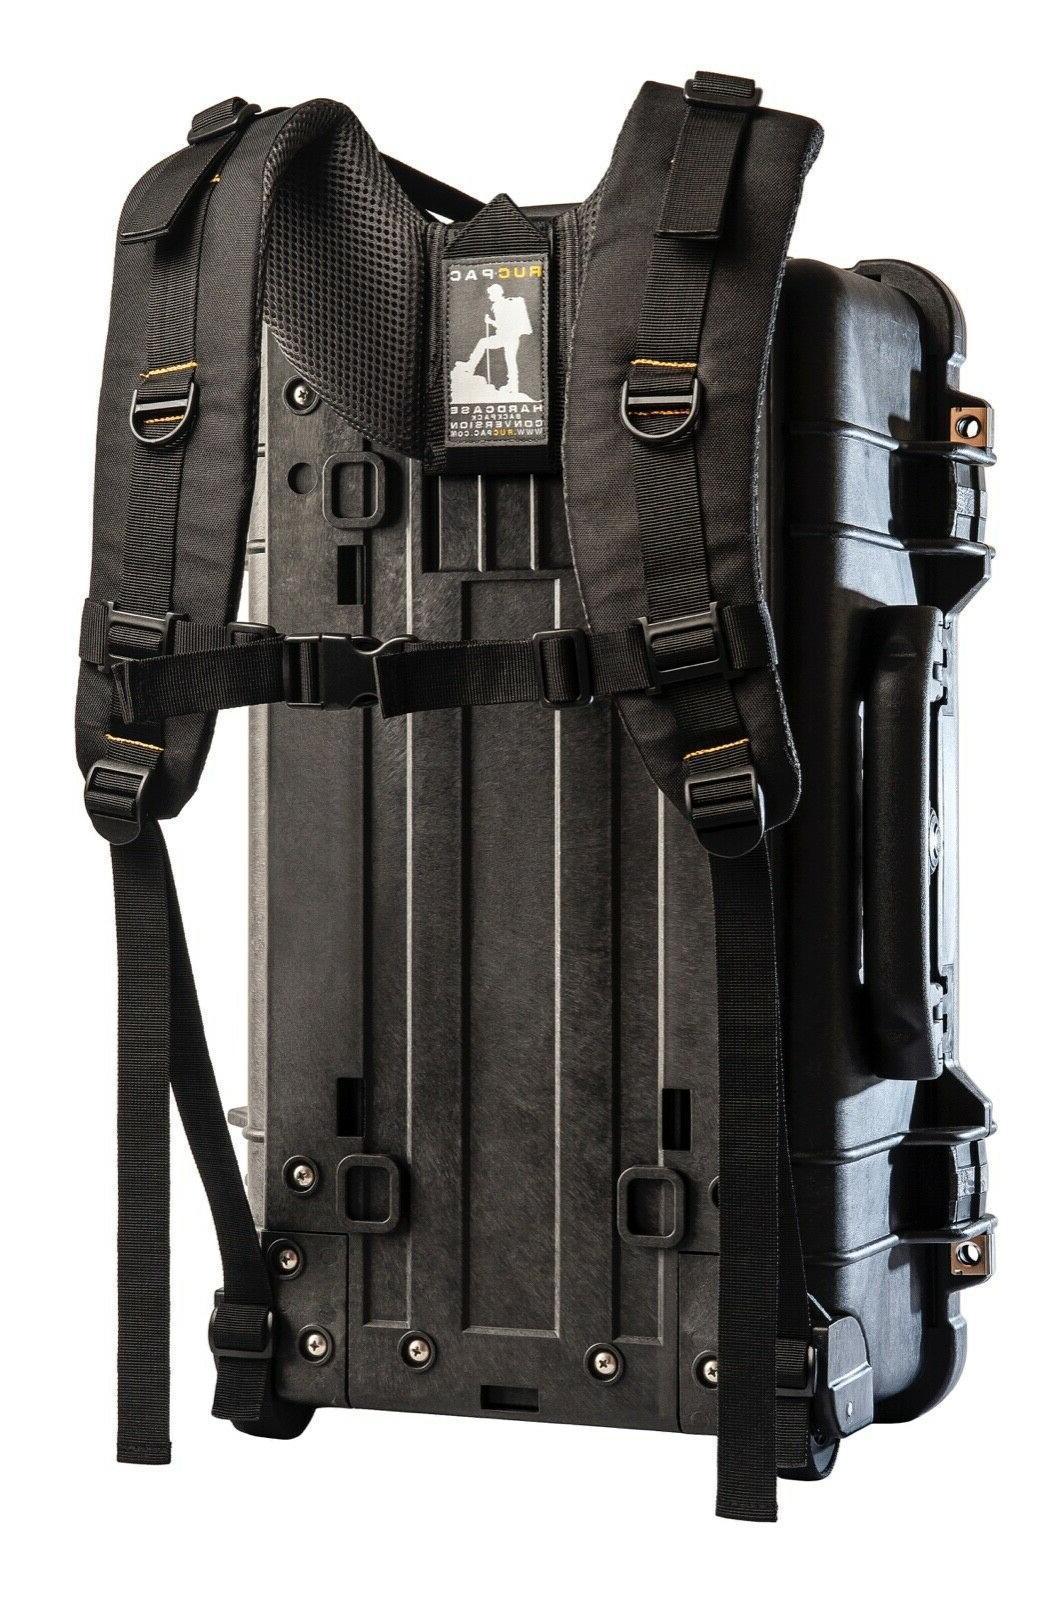 e39cee7e36 RucPac Hardcase Backpack Conversion for Peli/Pelican 1510/1535/1560+/ &